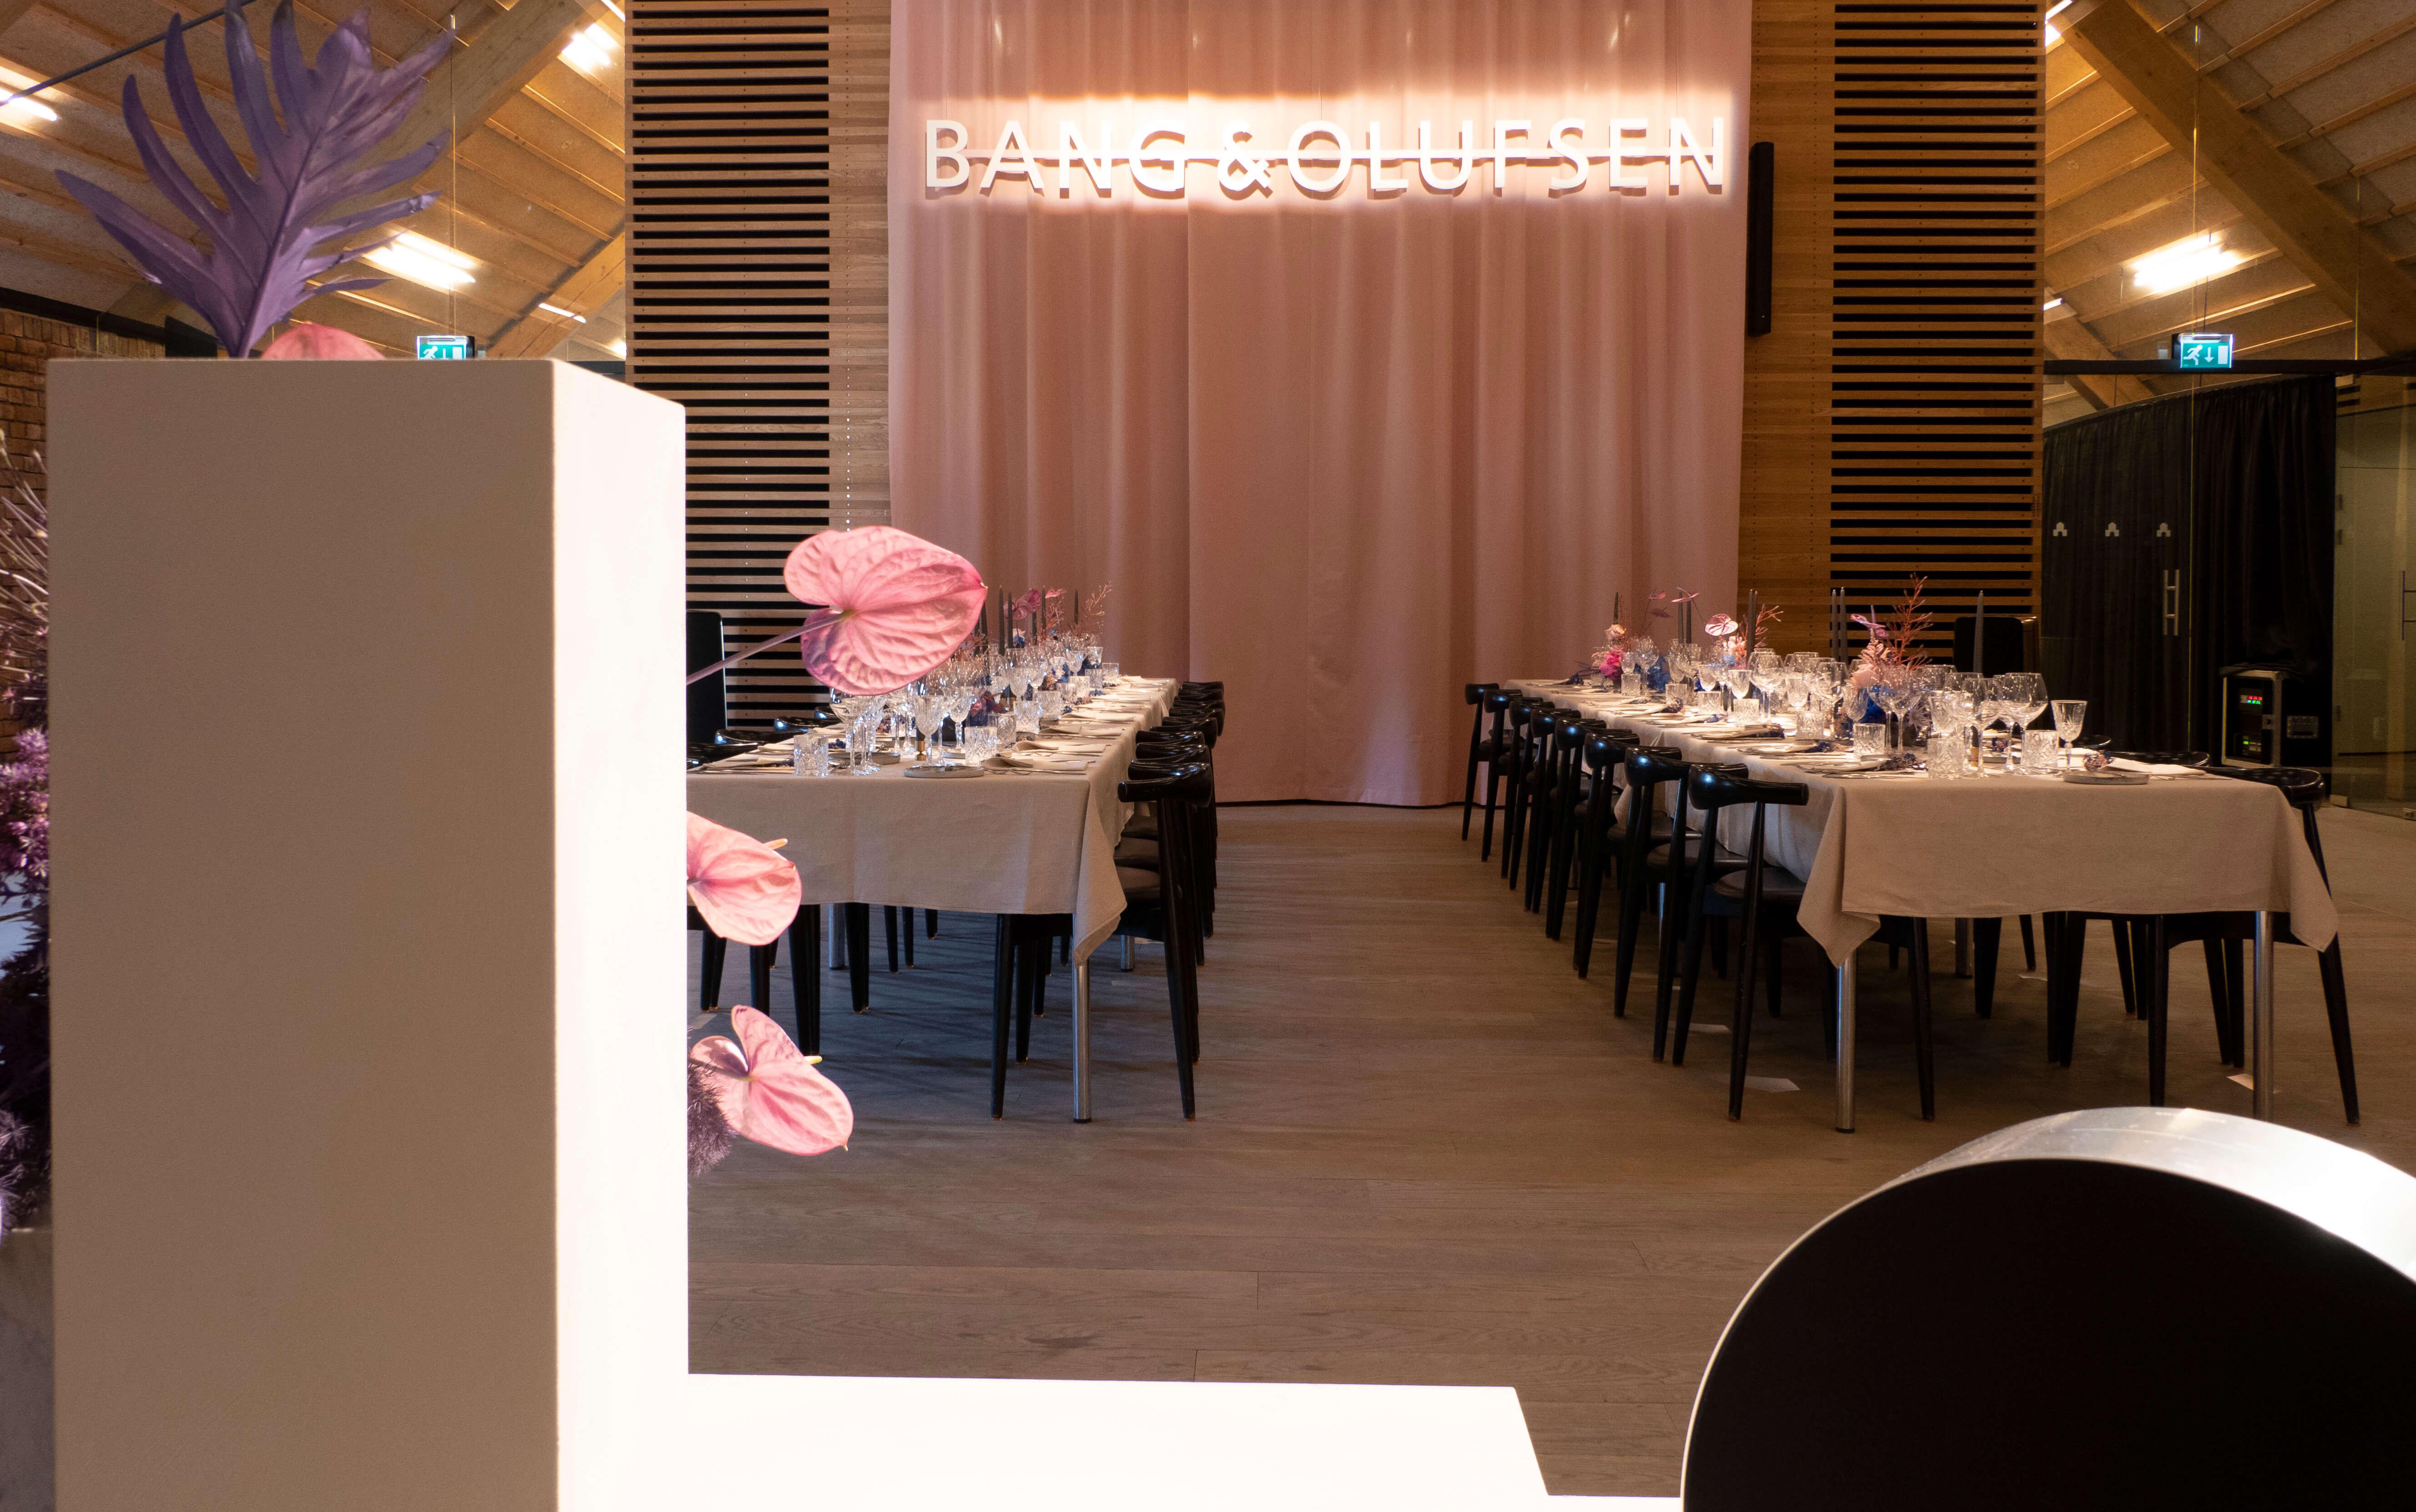 Bang og olufsen_Beosound edge_a table story